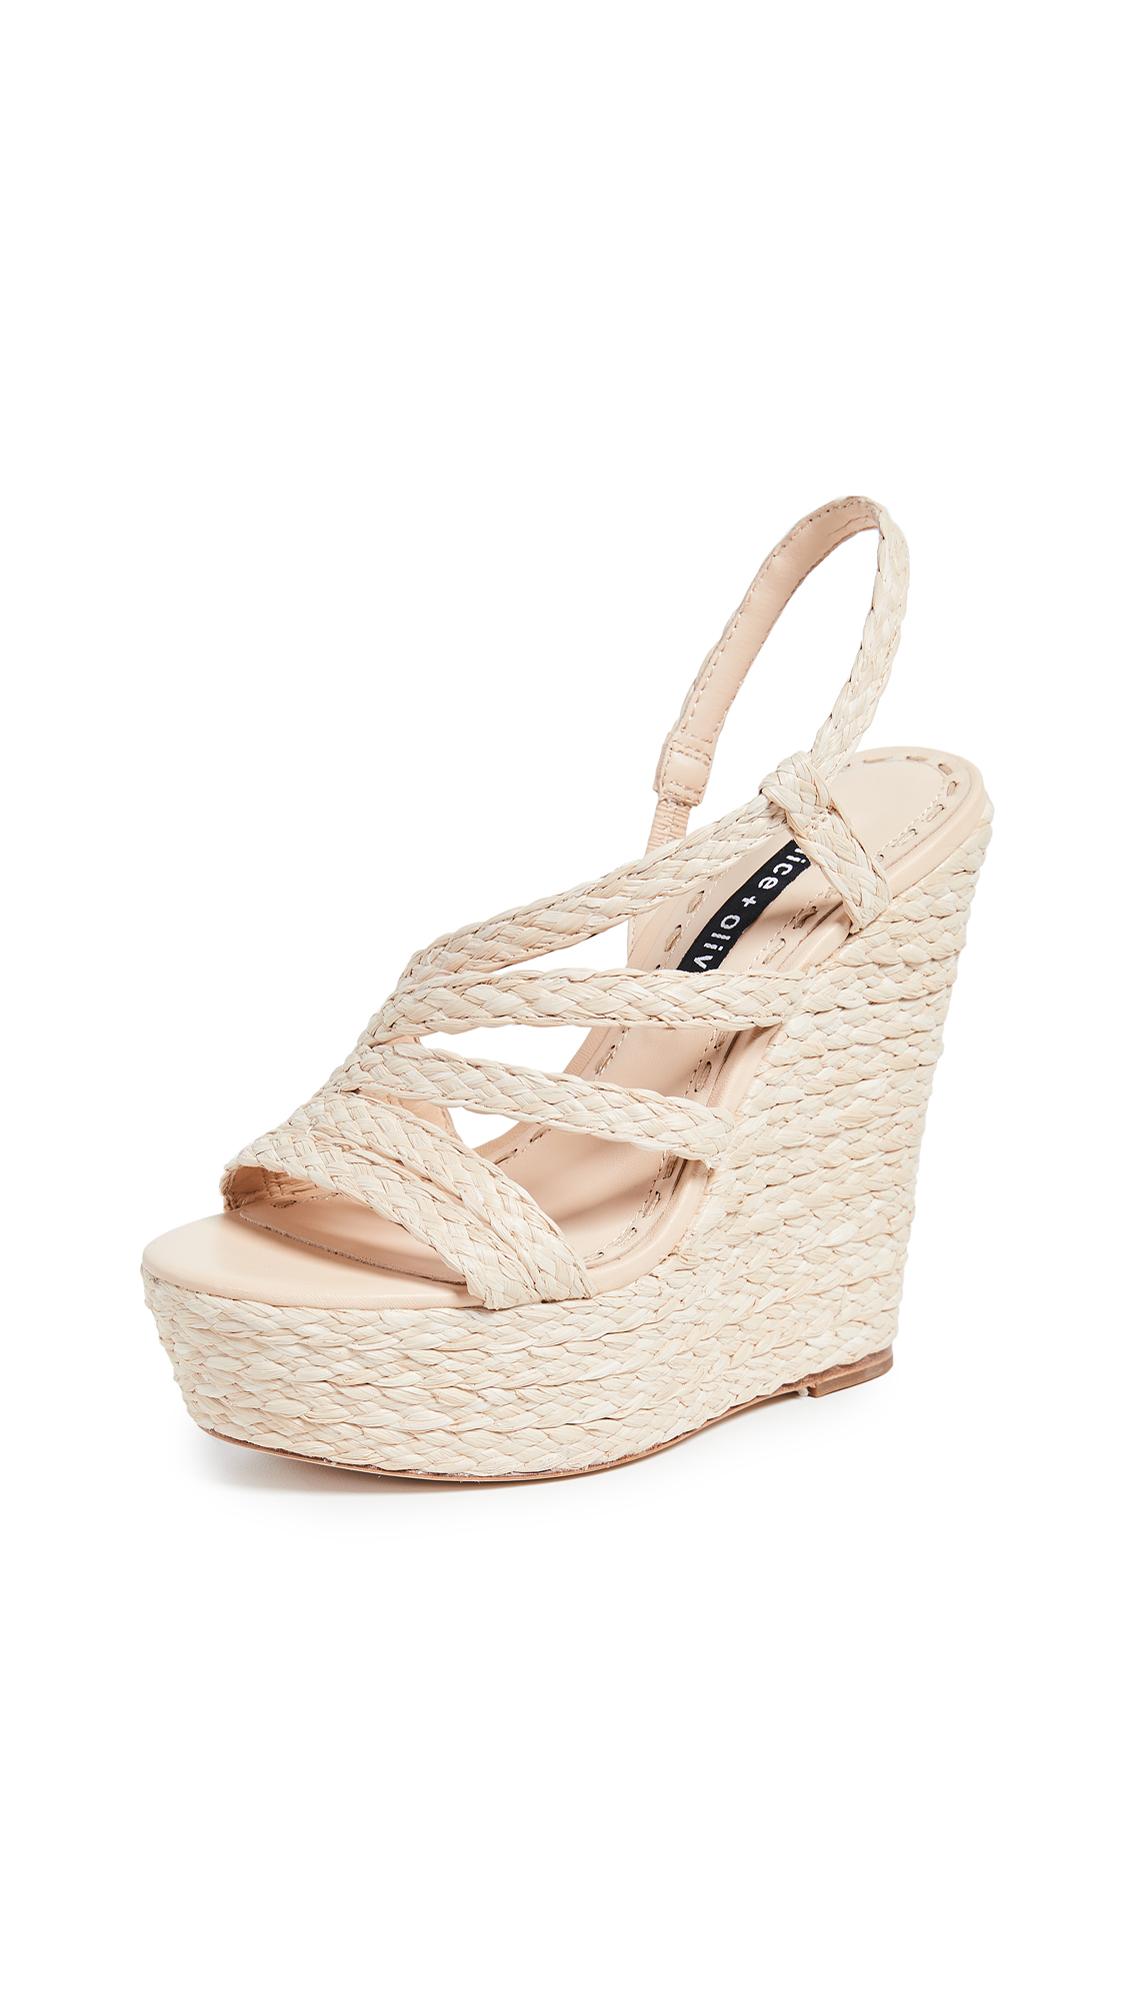 Buy alice + olivia Tenley Platform Sandals online, shop alice + olivia